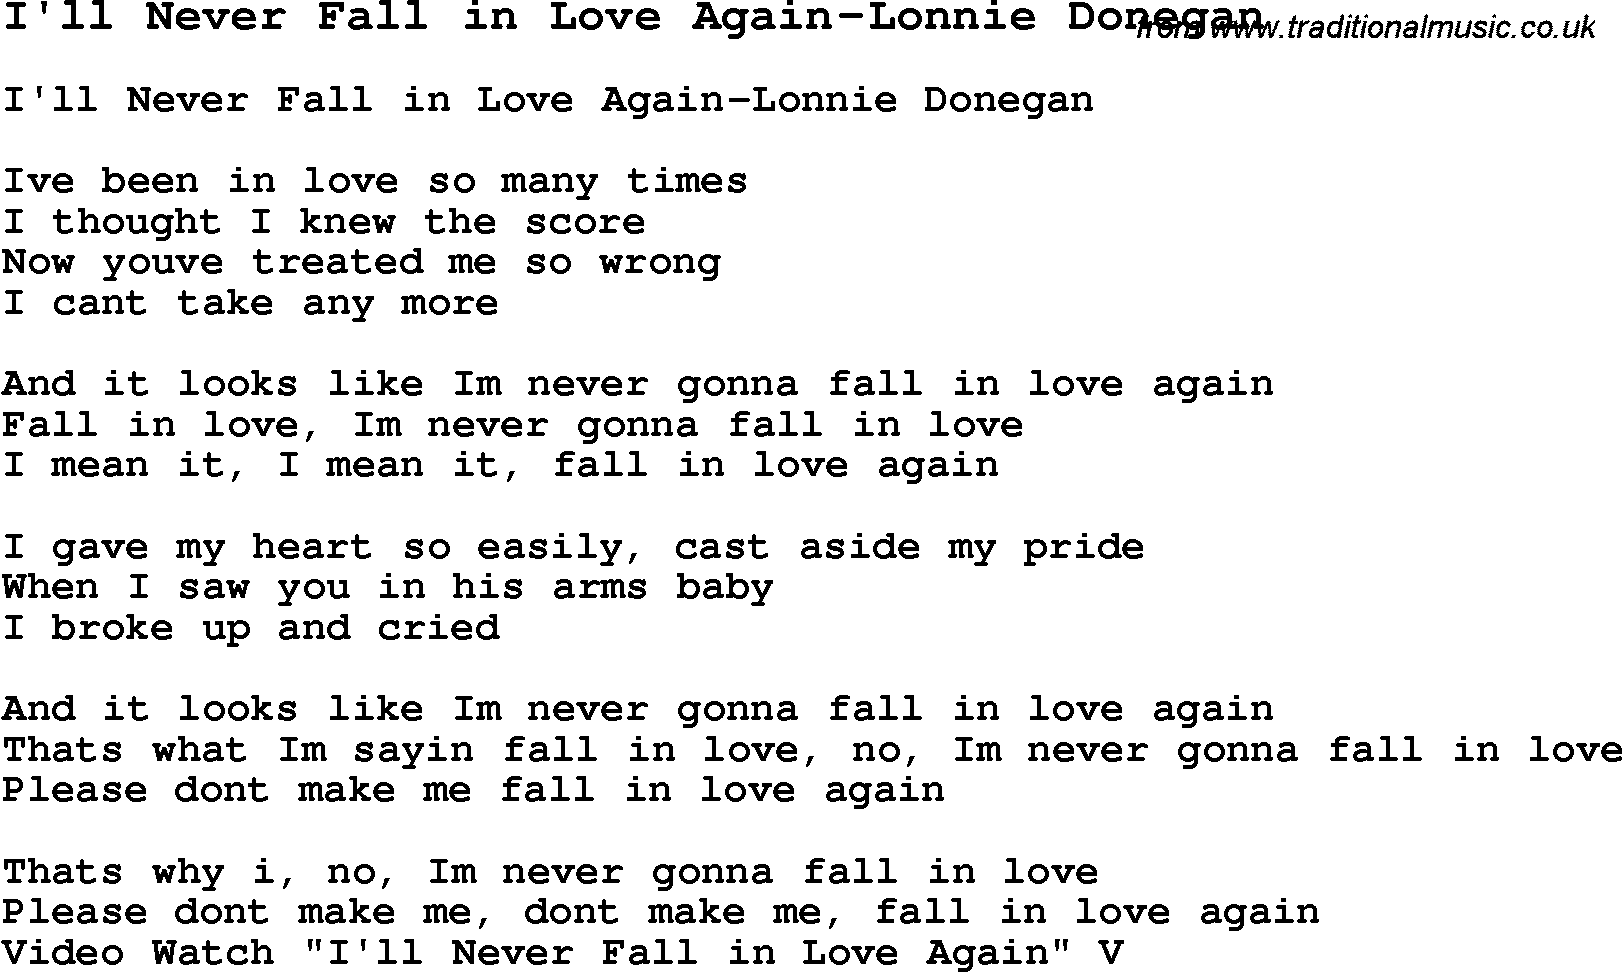 Skiffle Lyrics For Ill Never Fall In Love Again Lonnie Donegan